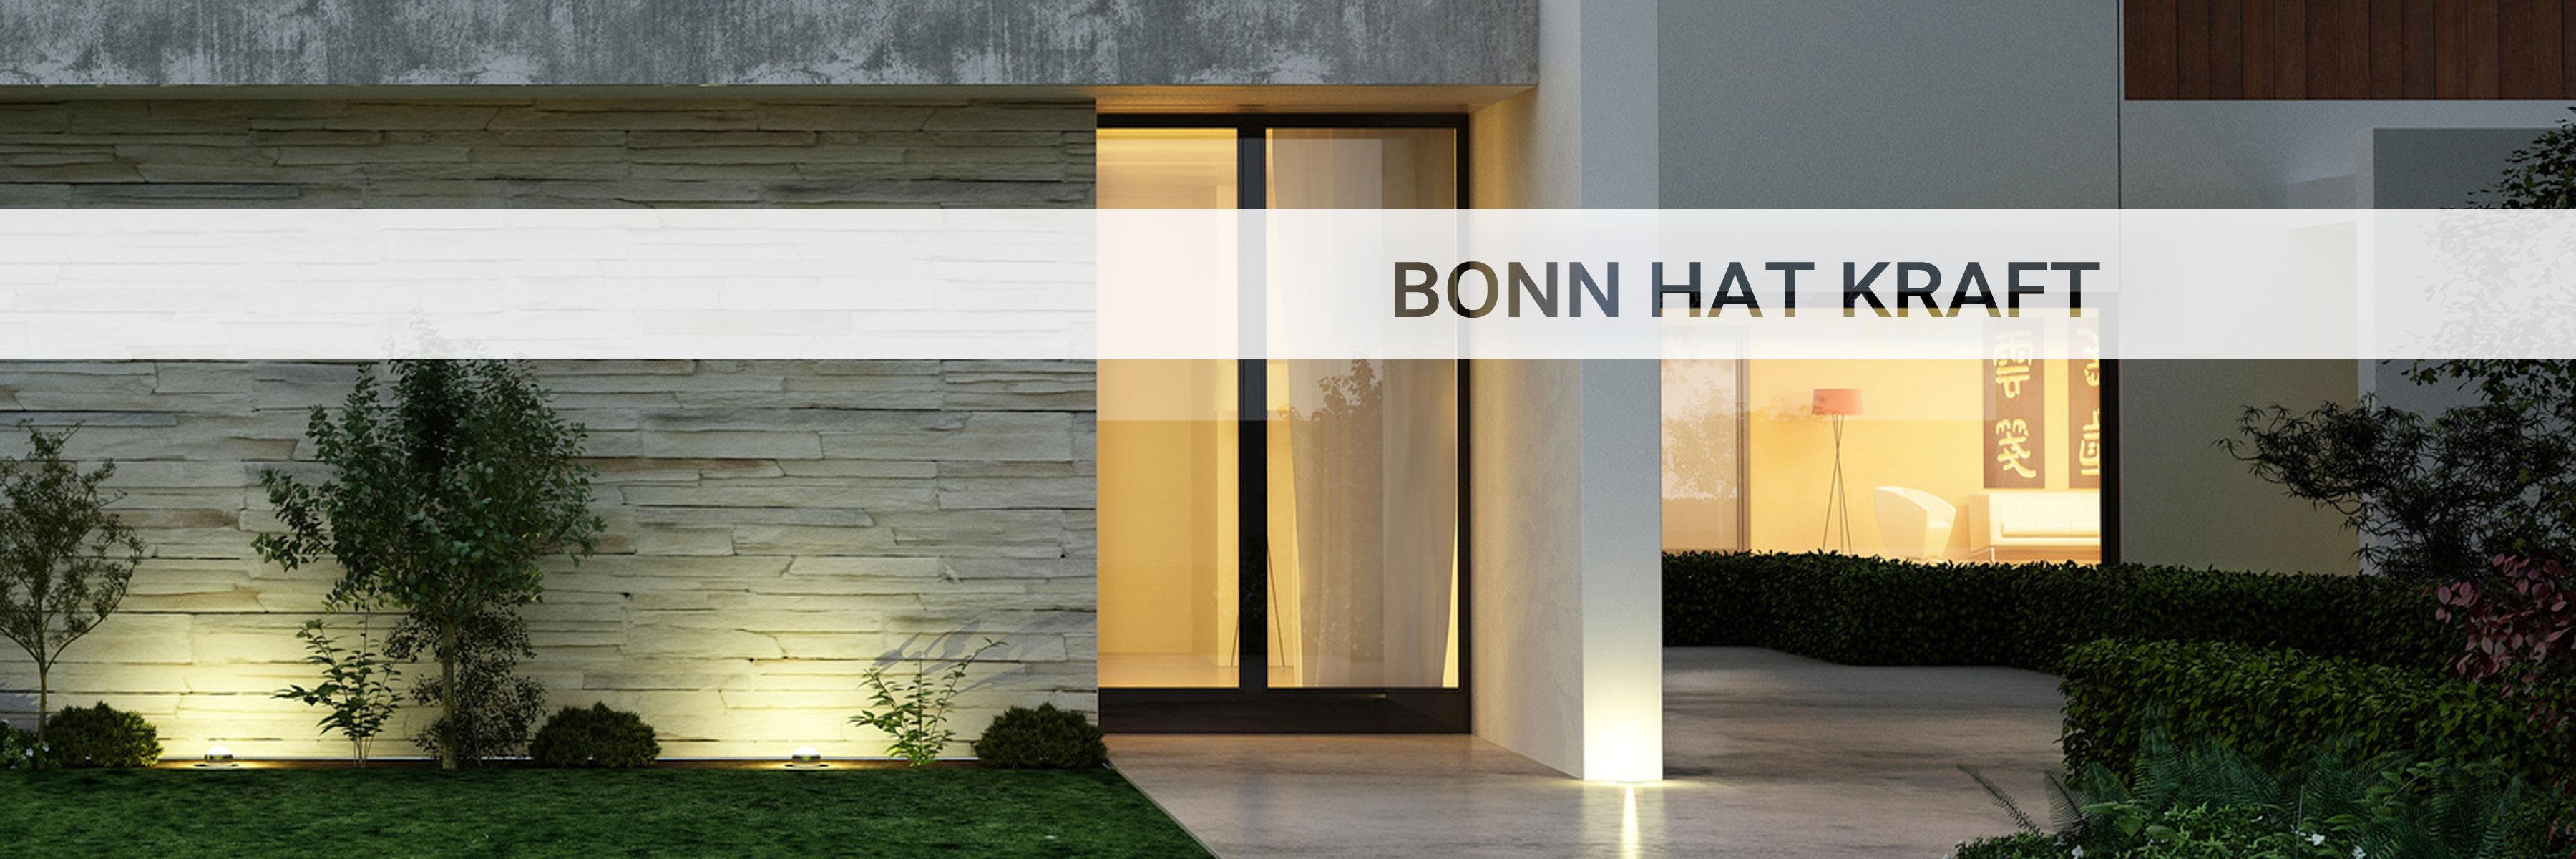 kraft bauprojekt gmbh kompetenter partner f r planung und baumanagement im hochbau. Black Bedroom Furniture Sets. Home Design Ideas